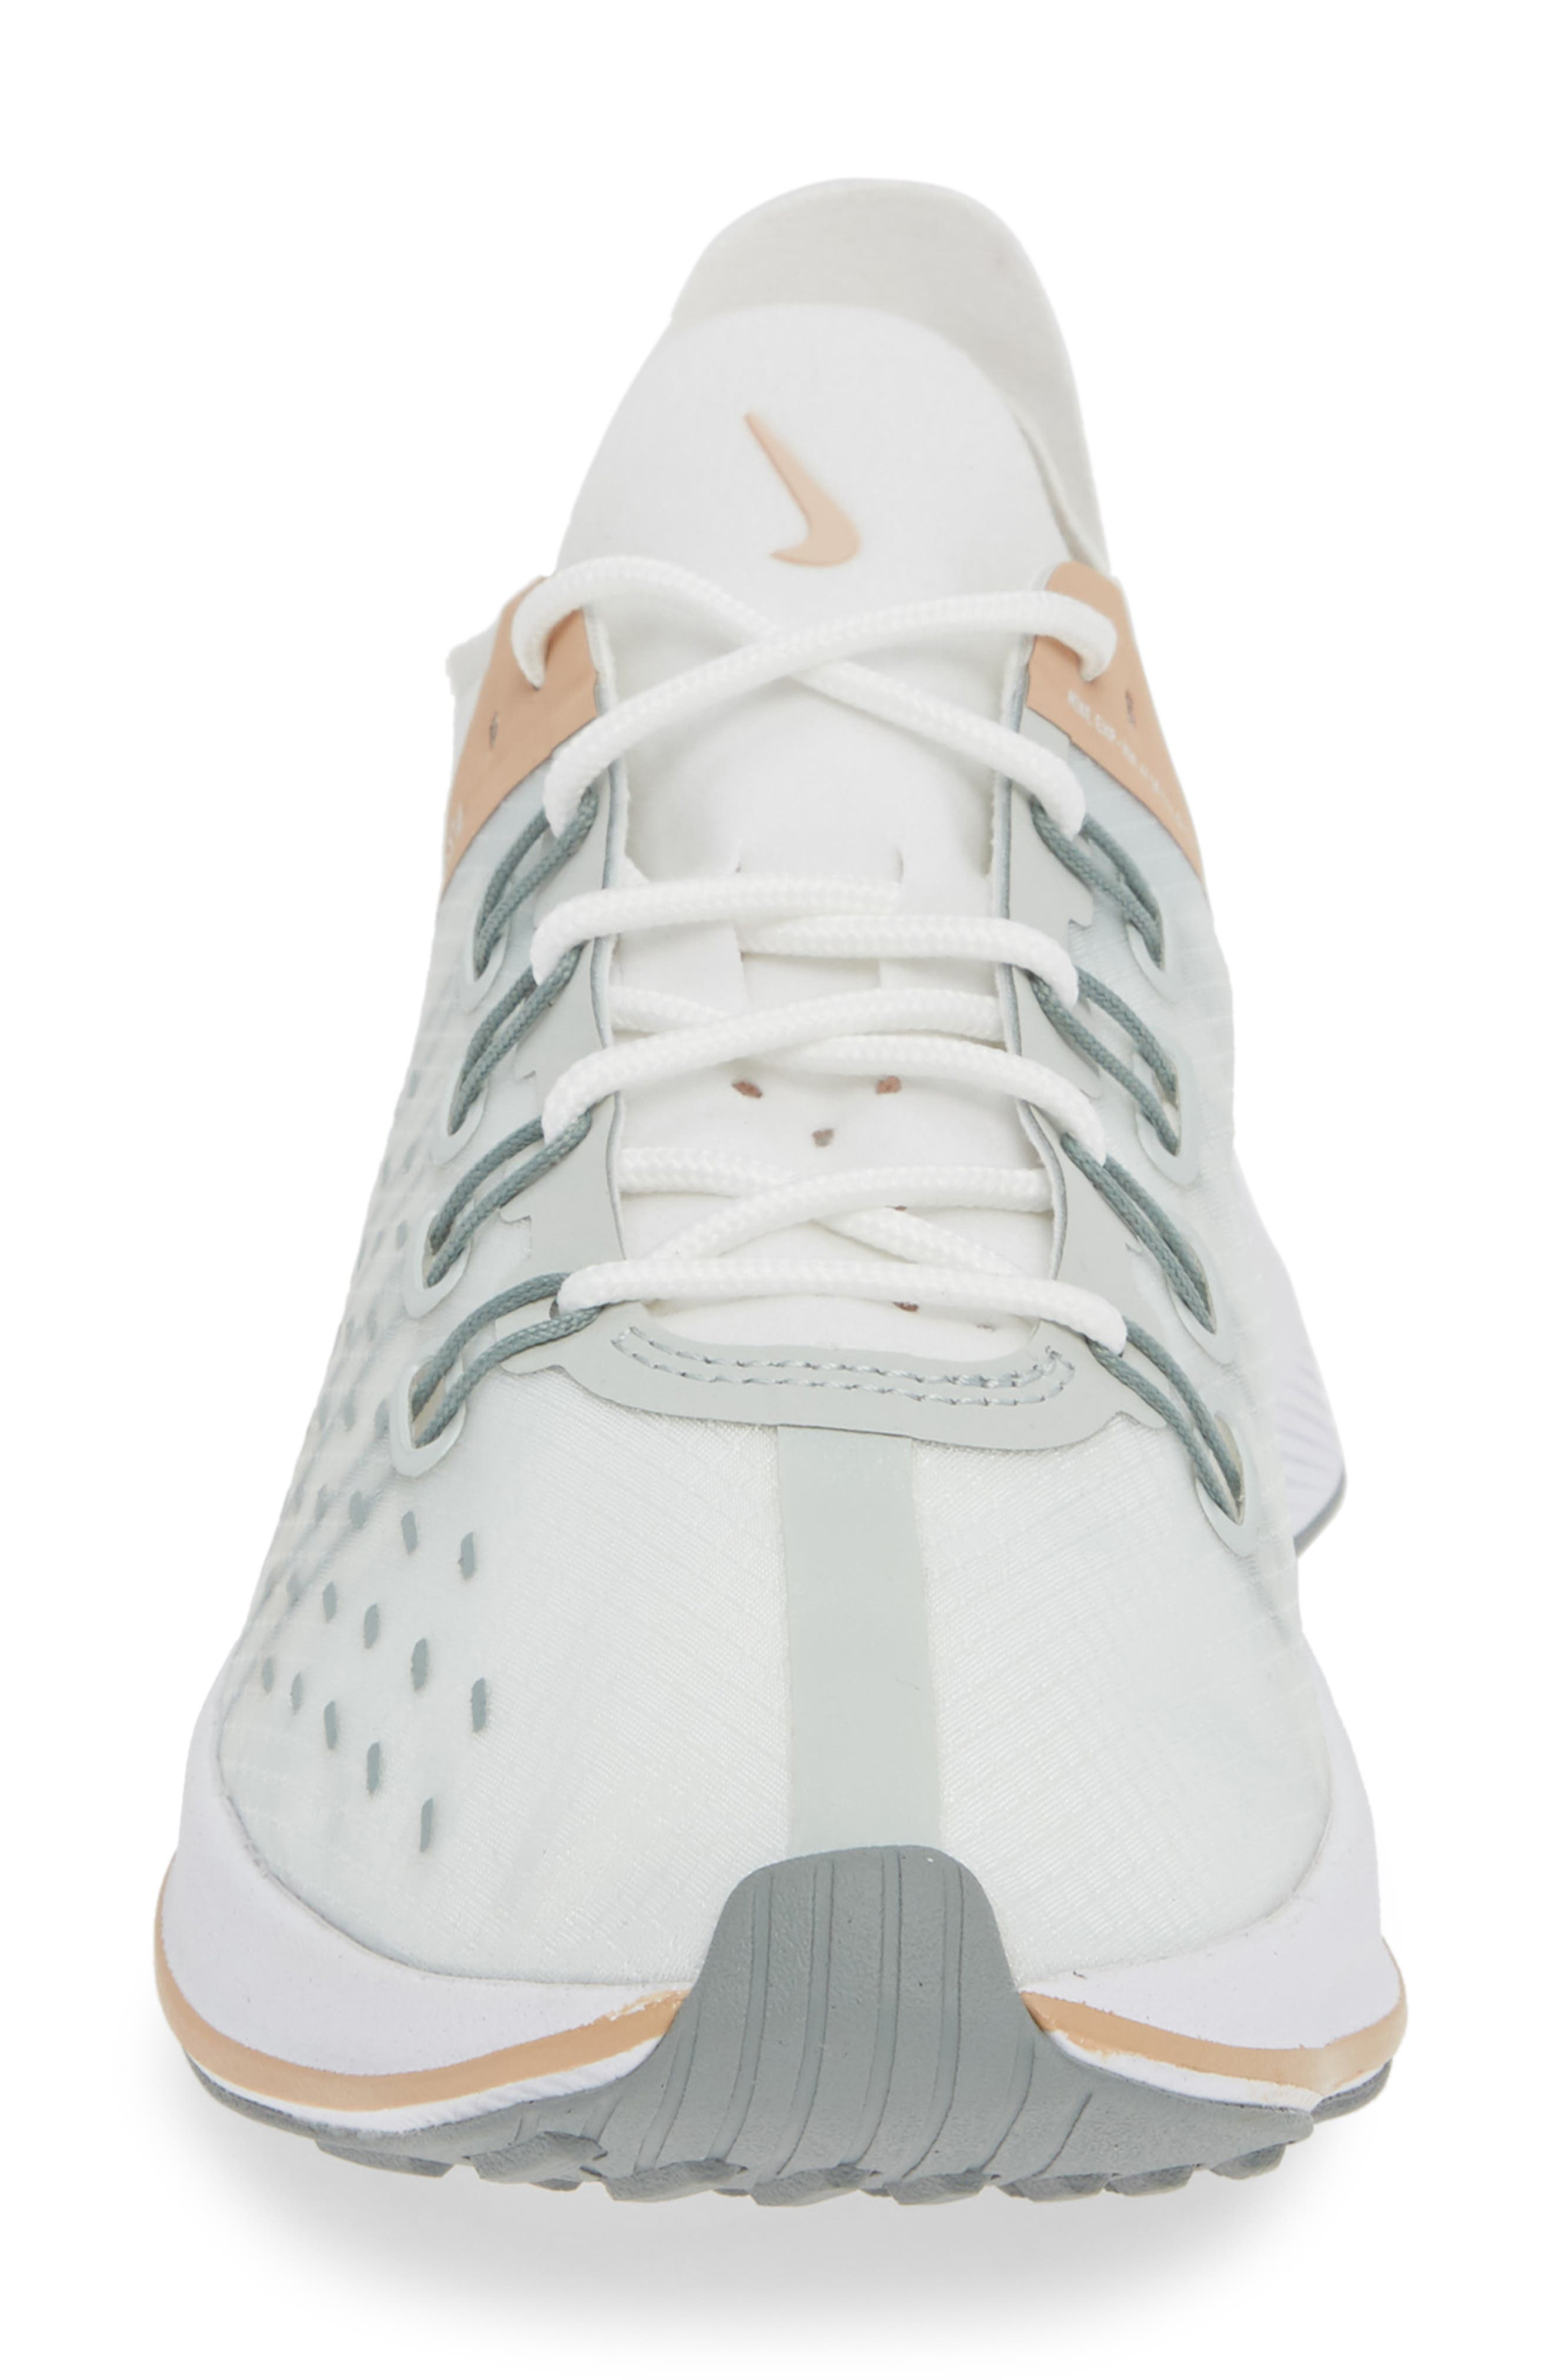 EXP-X14 Sneaker,                             Alternate thumbnail 4, color,                             SUMMIT WHITE/ LIGHT SILVER